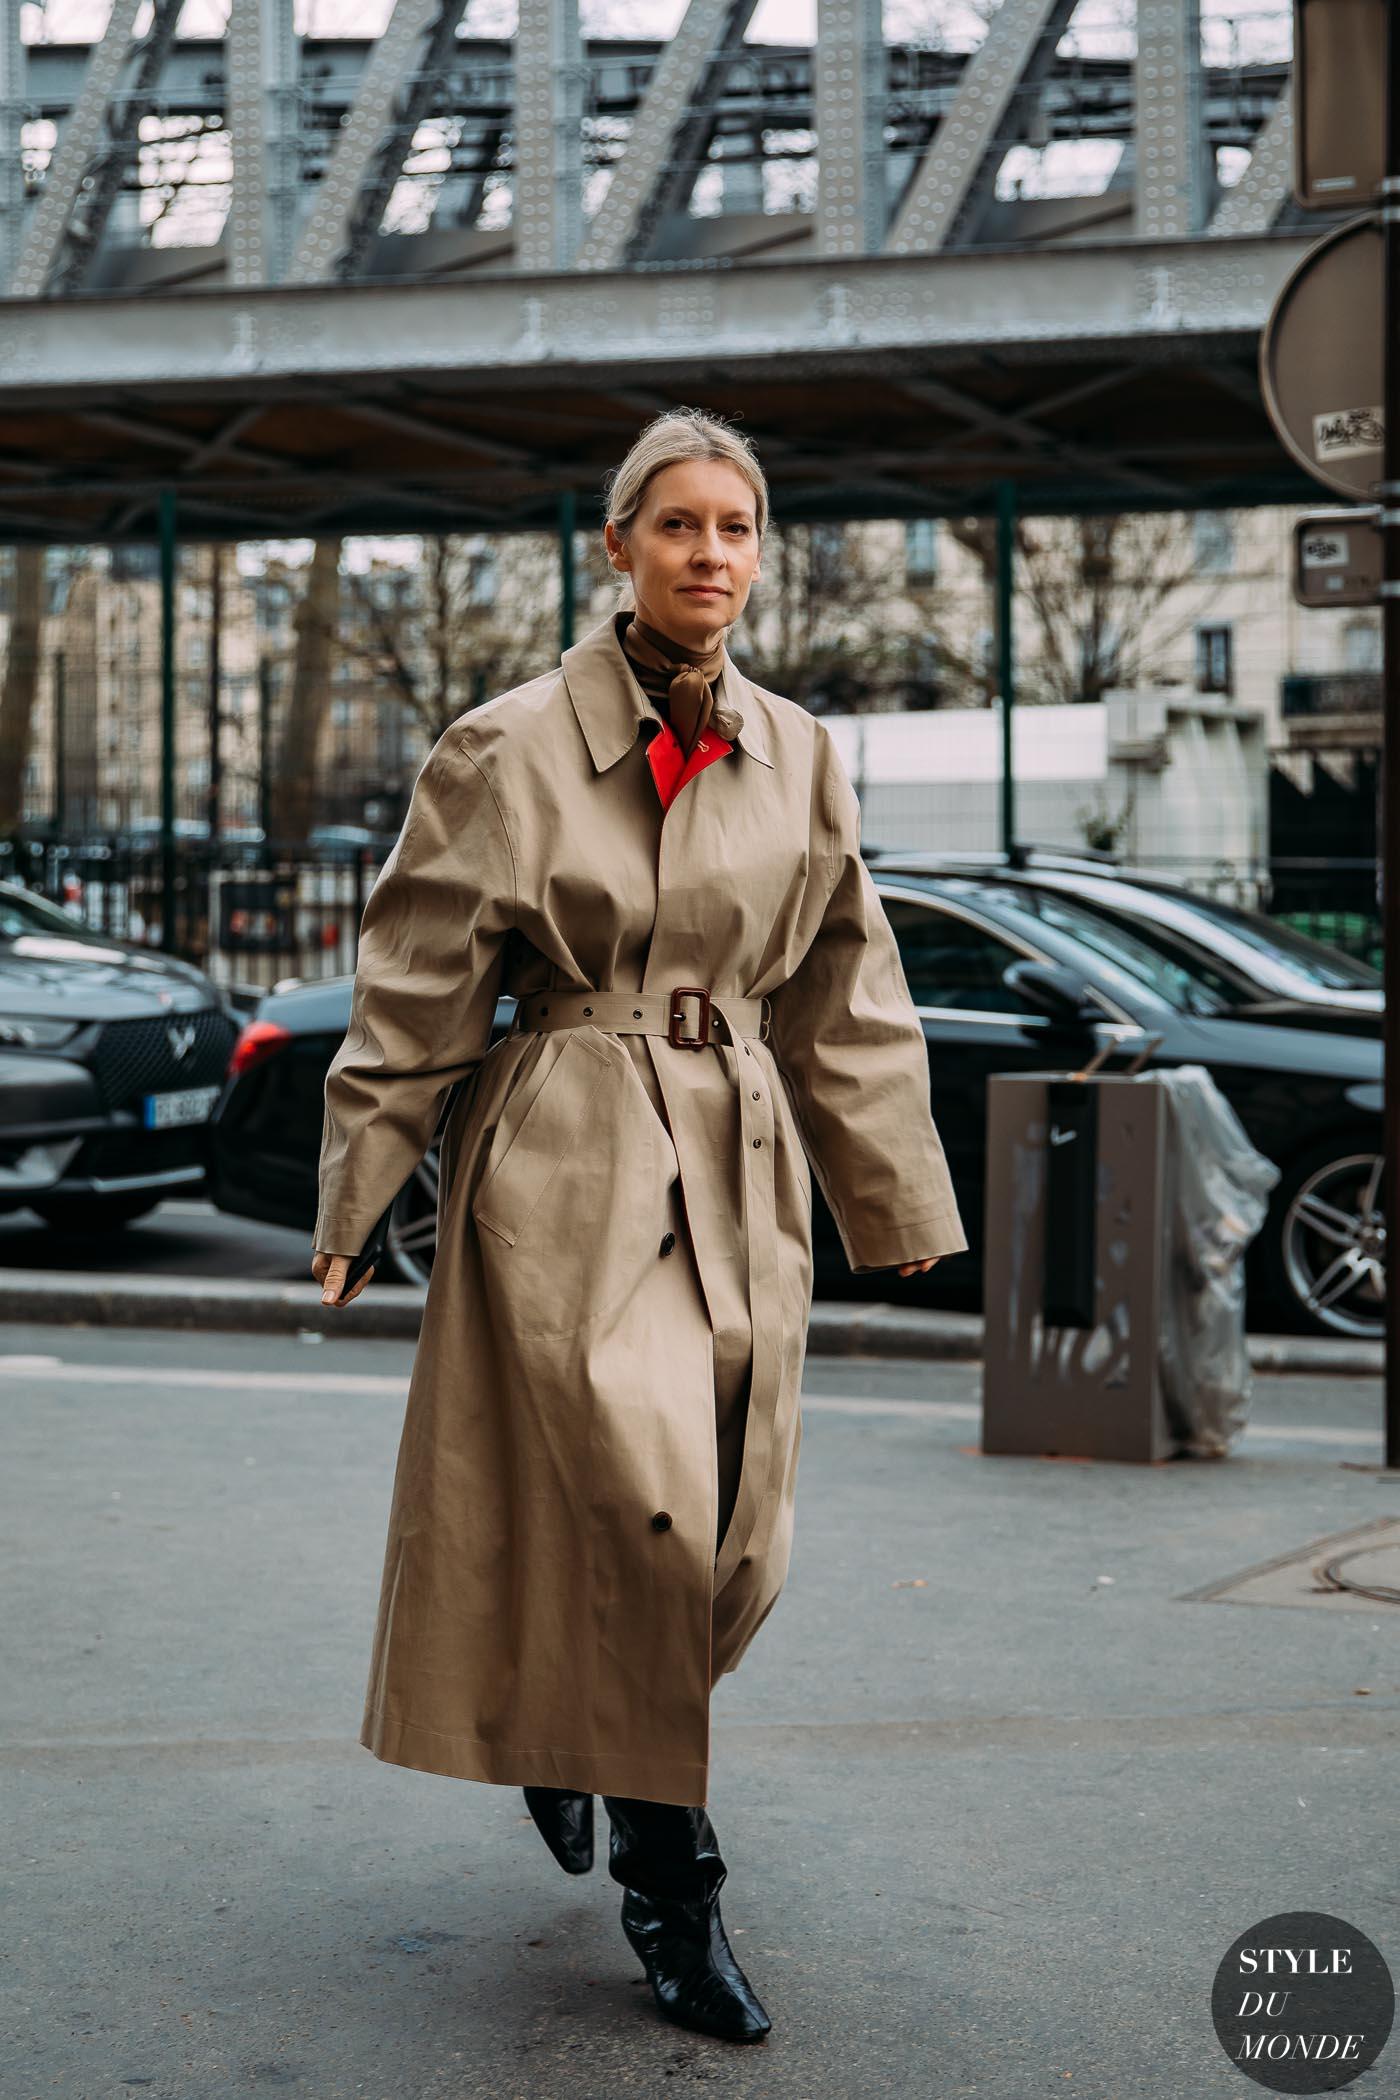 Paris FW 2020 Street Style: Suzanne Koller - STYLE DU